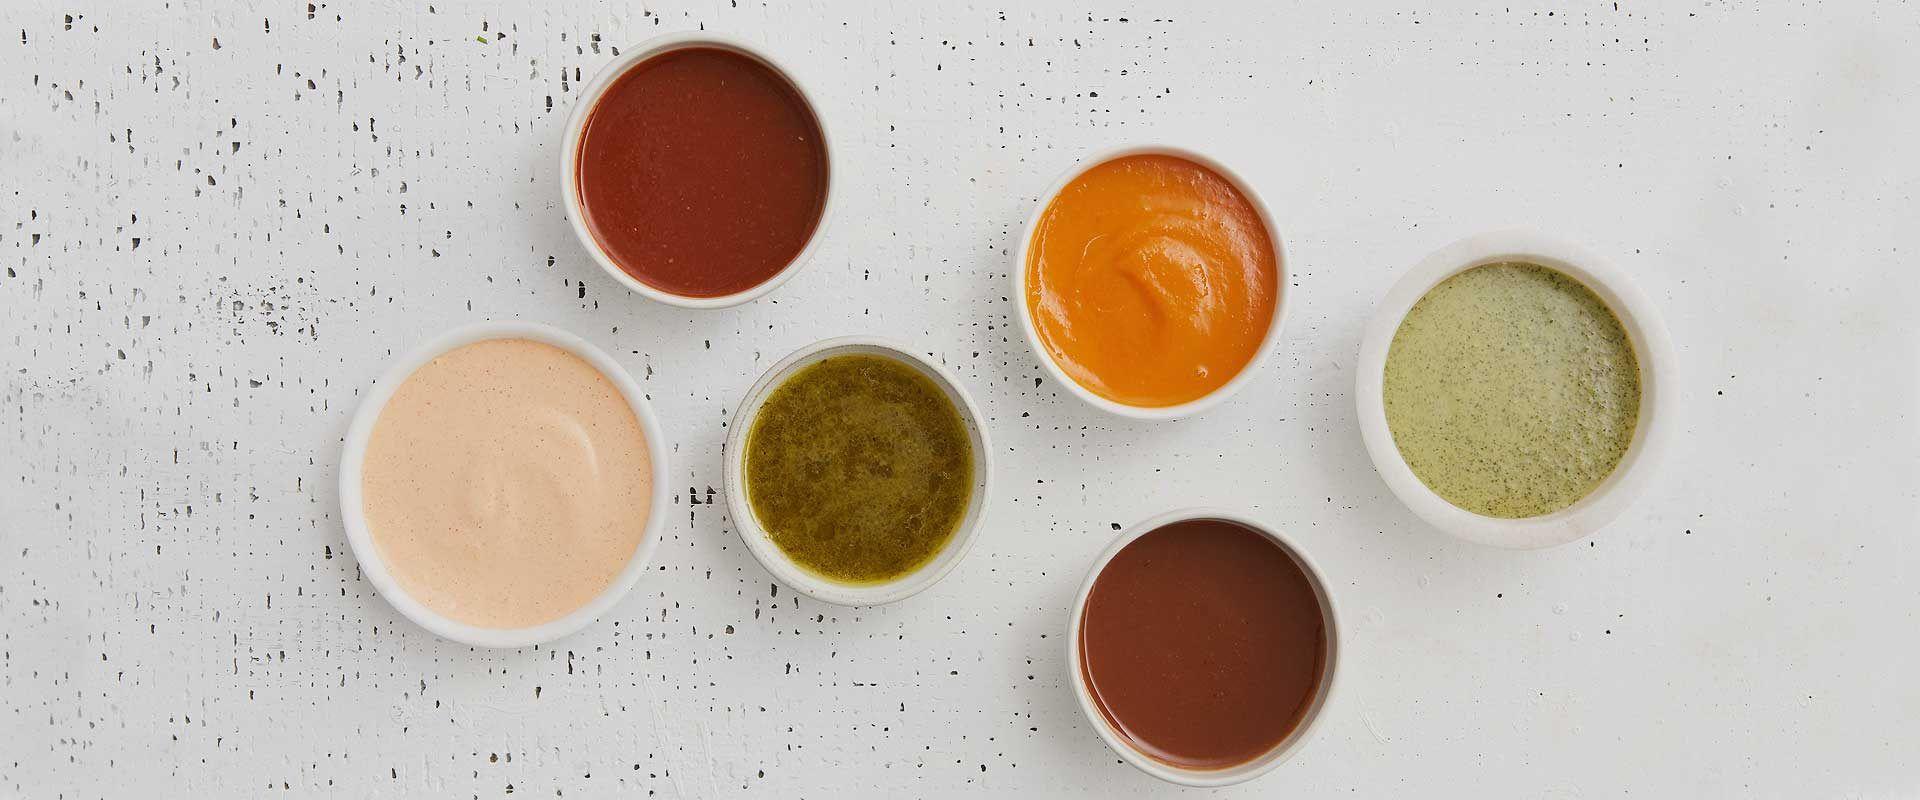 sauces and chutneys on a table